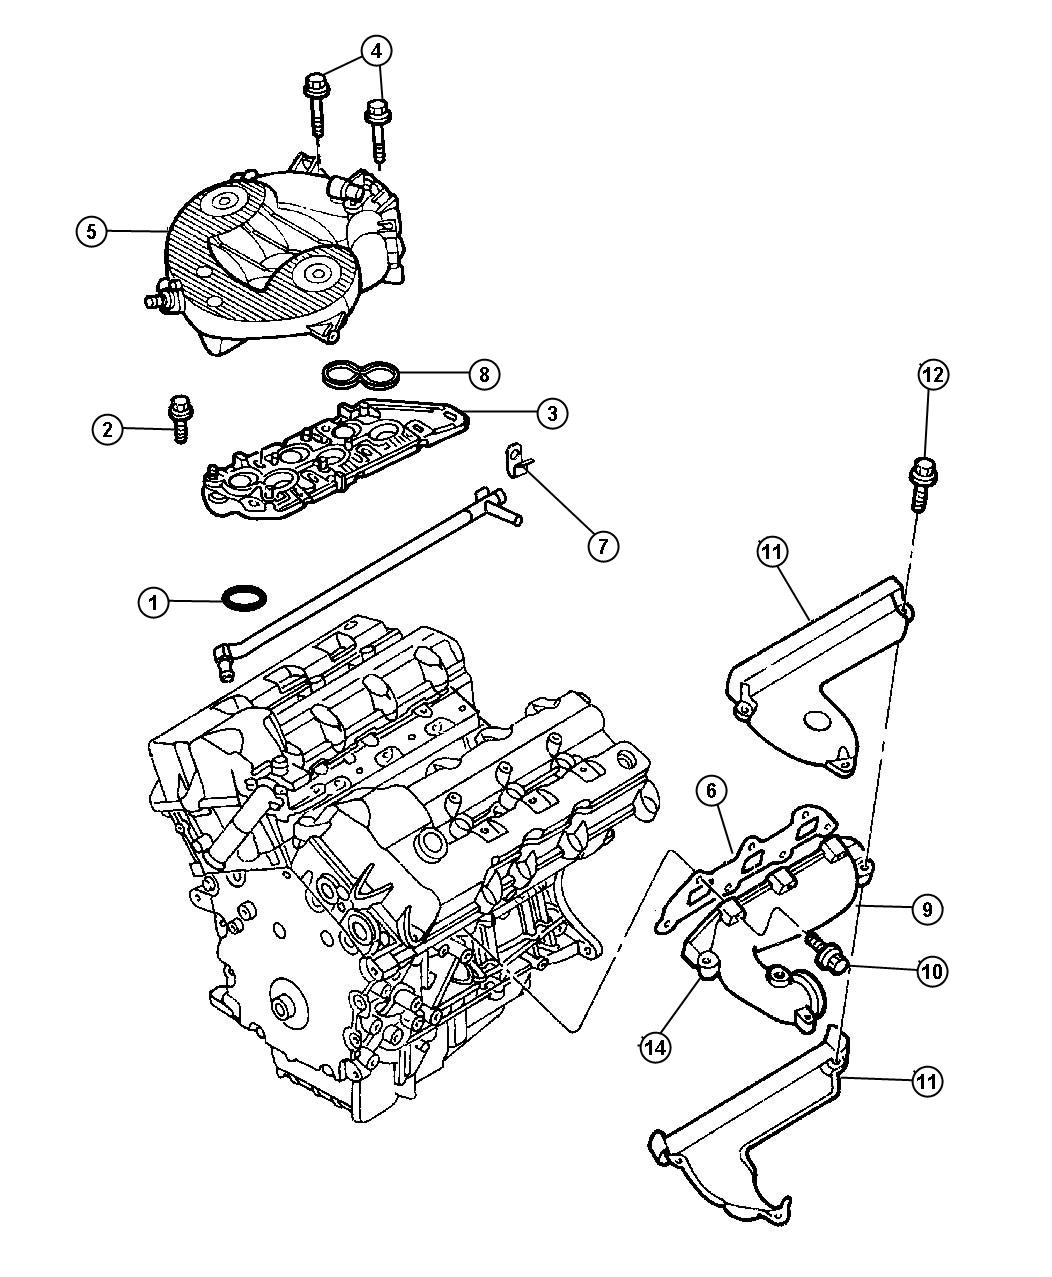 Dodge Intrepid Bolt. Hex flange head, lock patch. M6x1